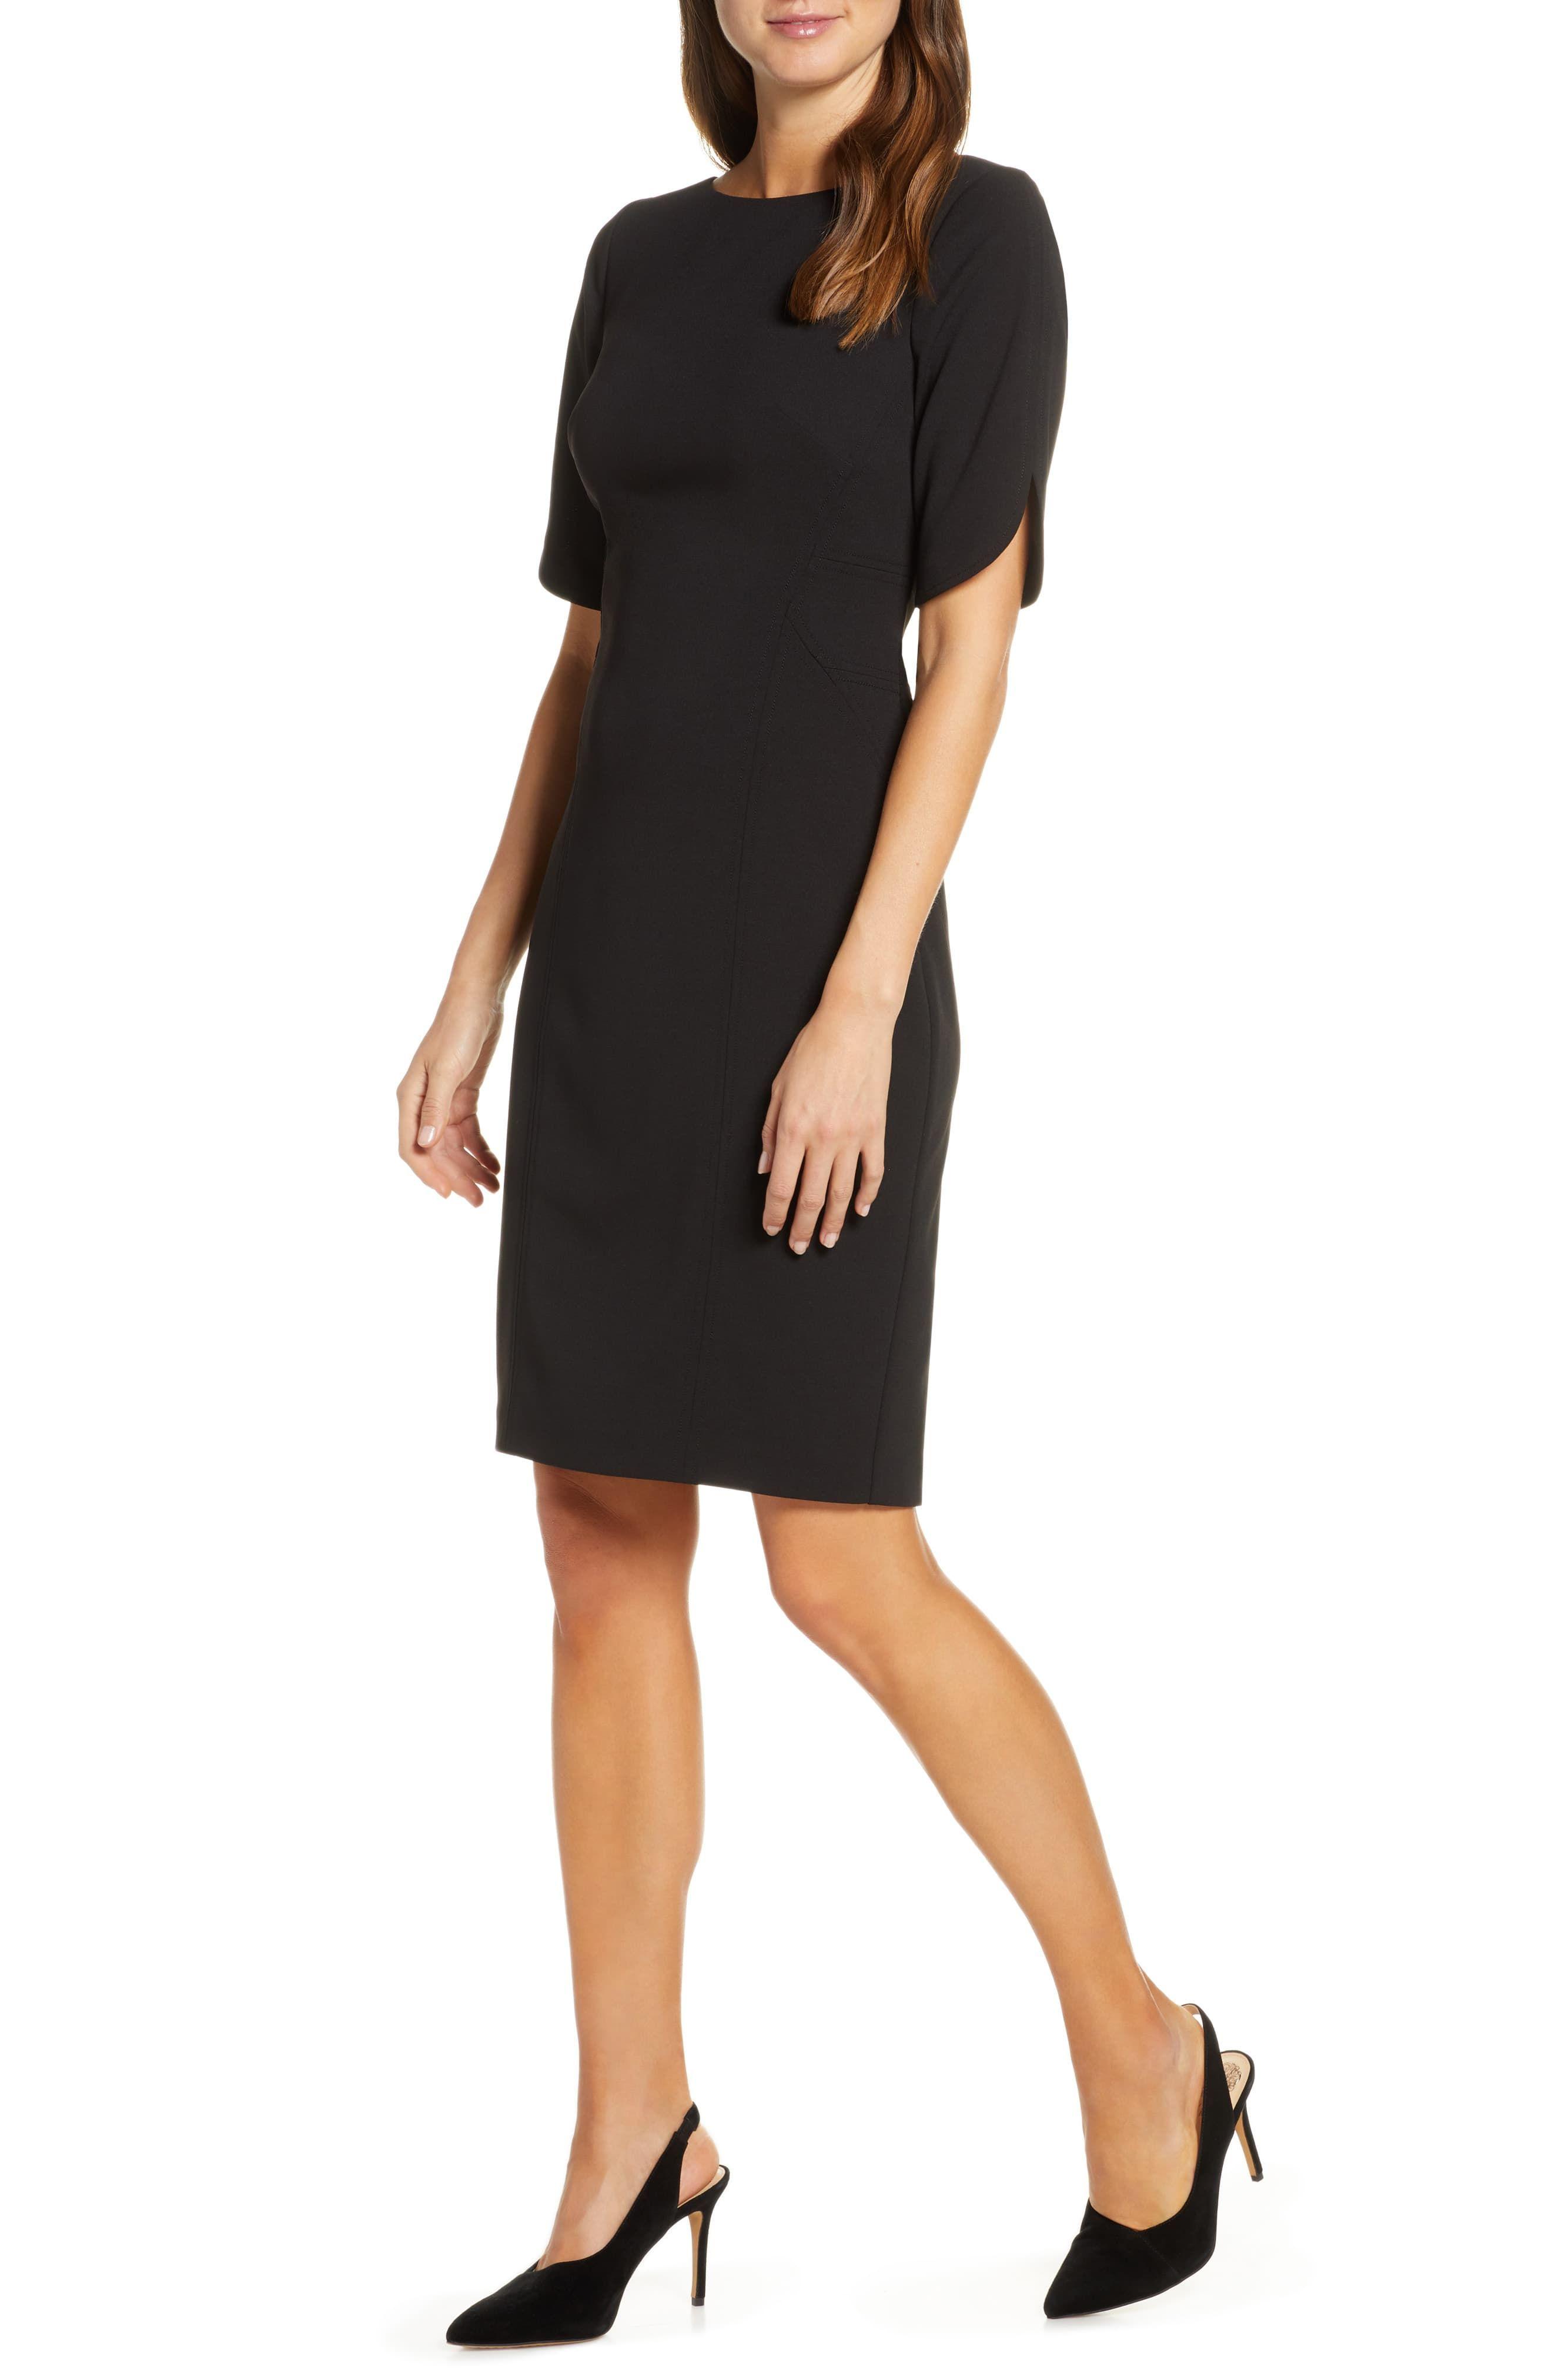 Vince Camuto Scuba Crepe Sheath Dress Nordstrom Black Sheath Dress Nordstrom Dresses Sheath Dress [ 4048 x 2640 Pixel ]